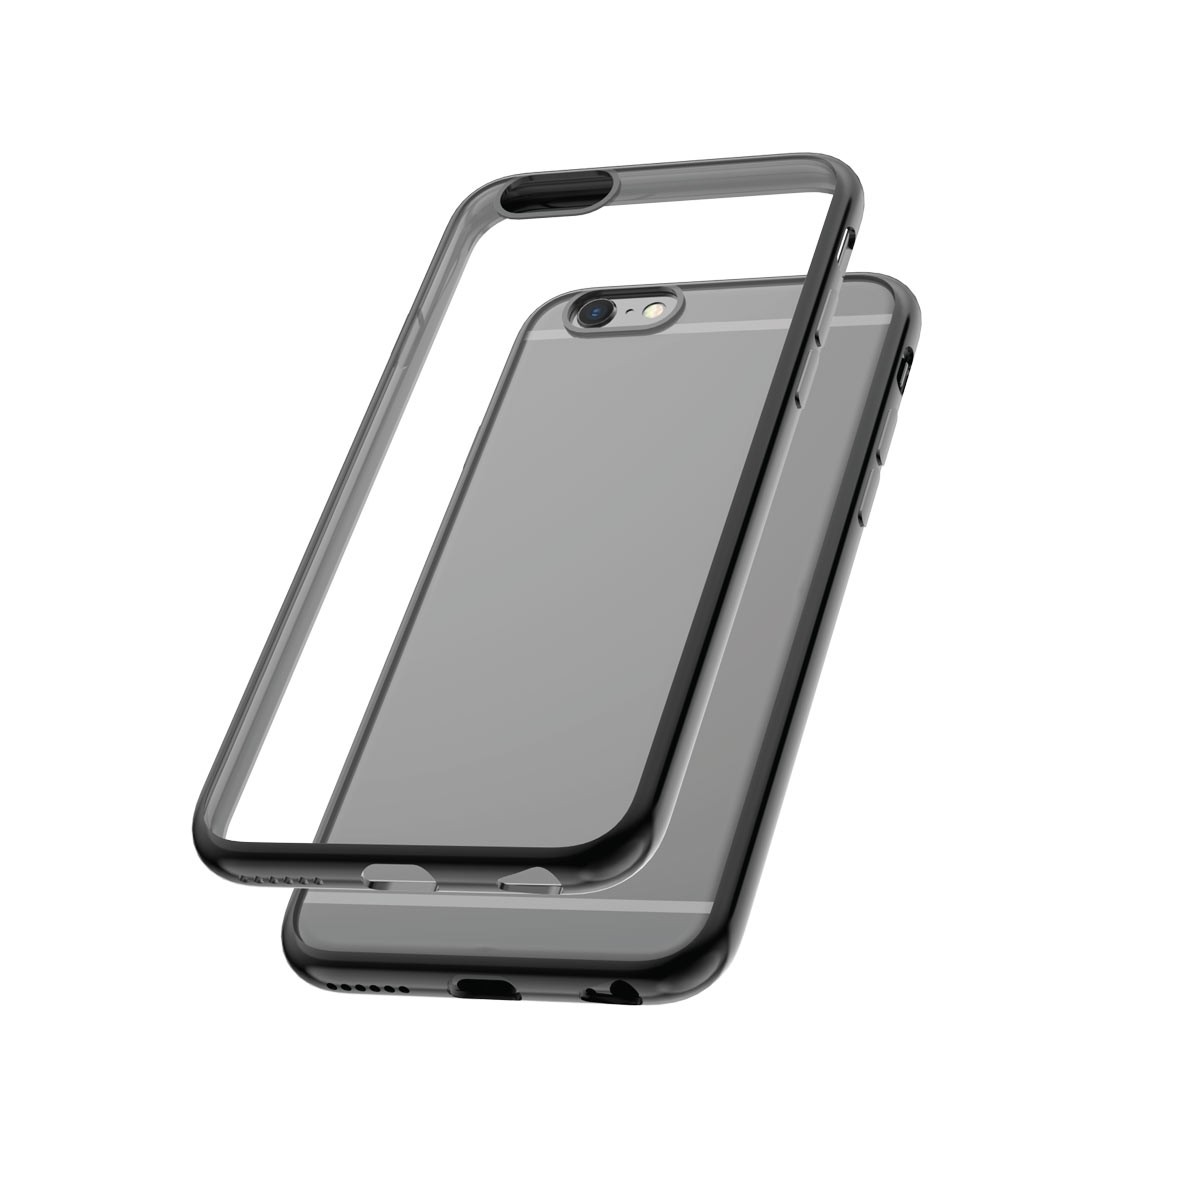 Capac protectie spate cellara colectia electro pentru iphone 6/6s - negru